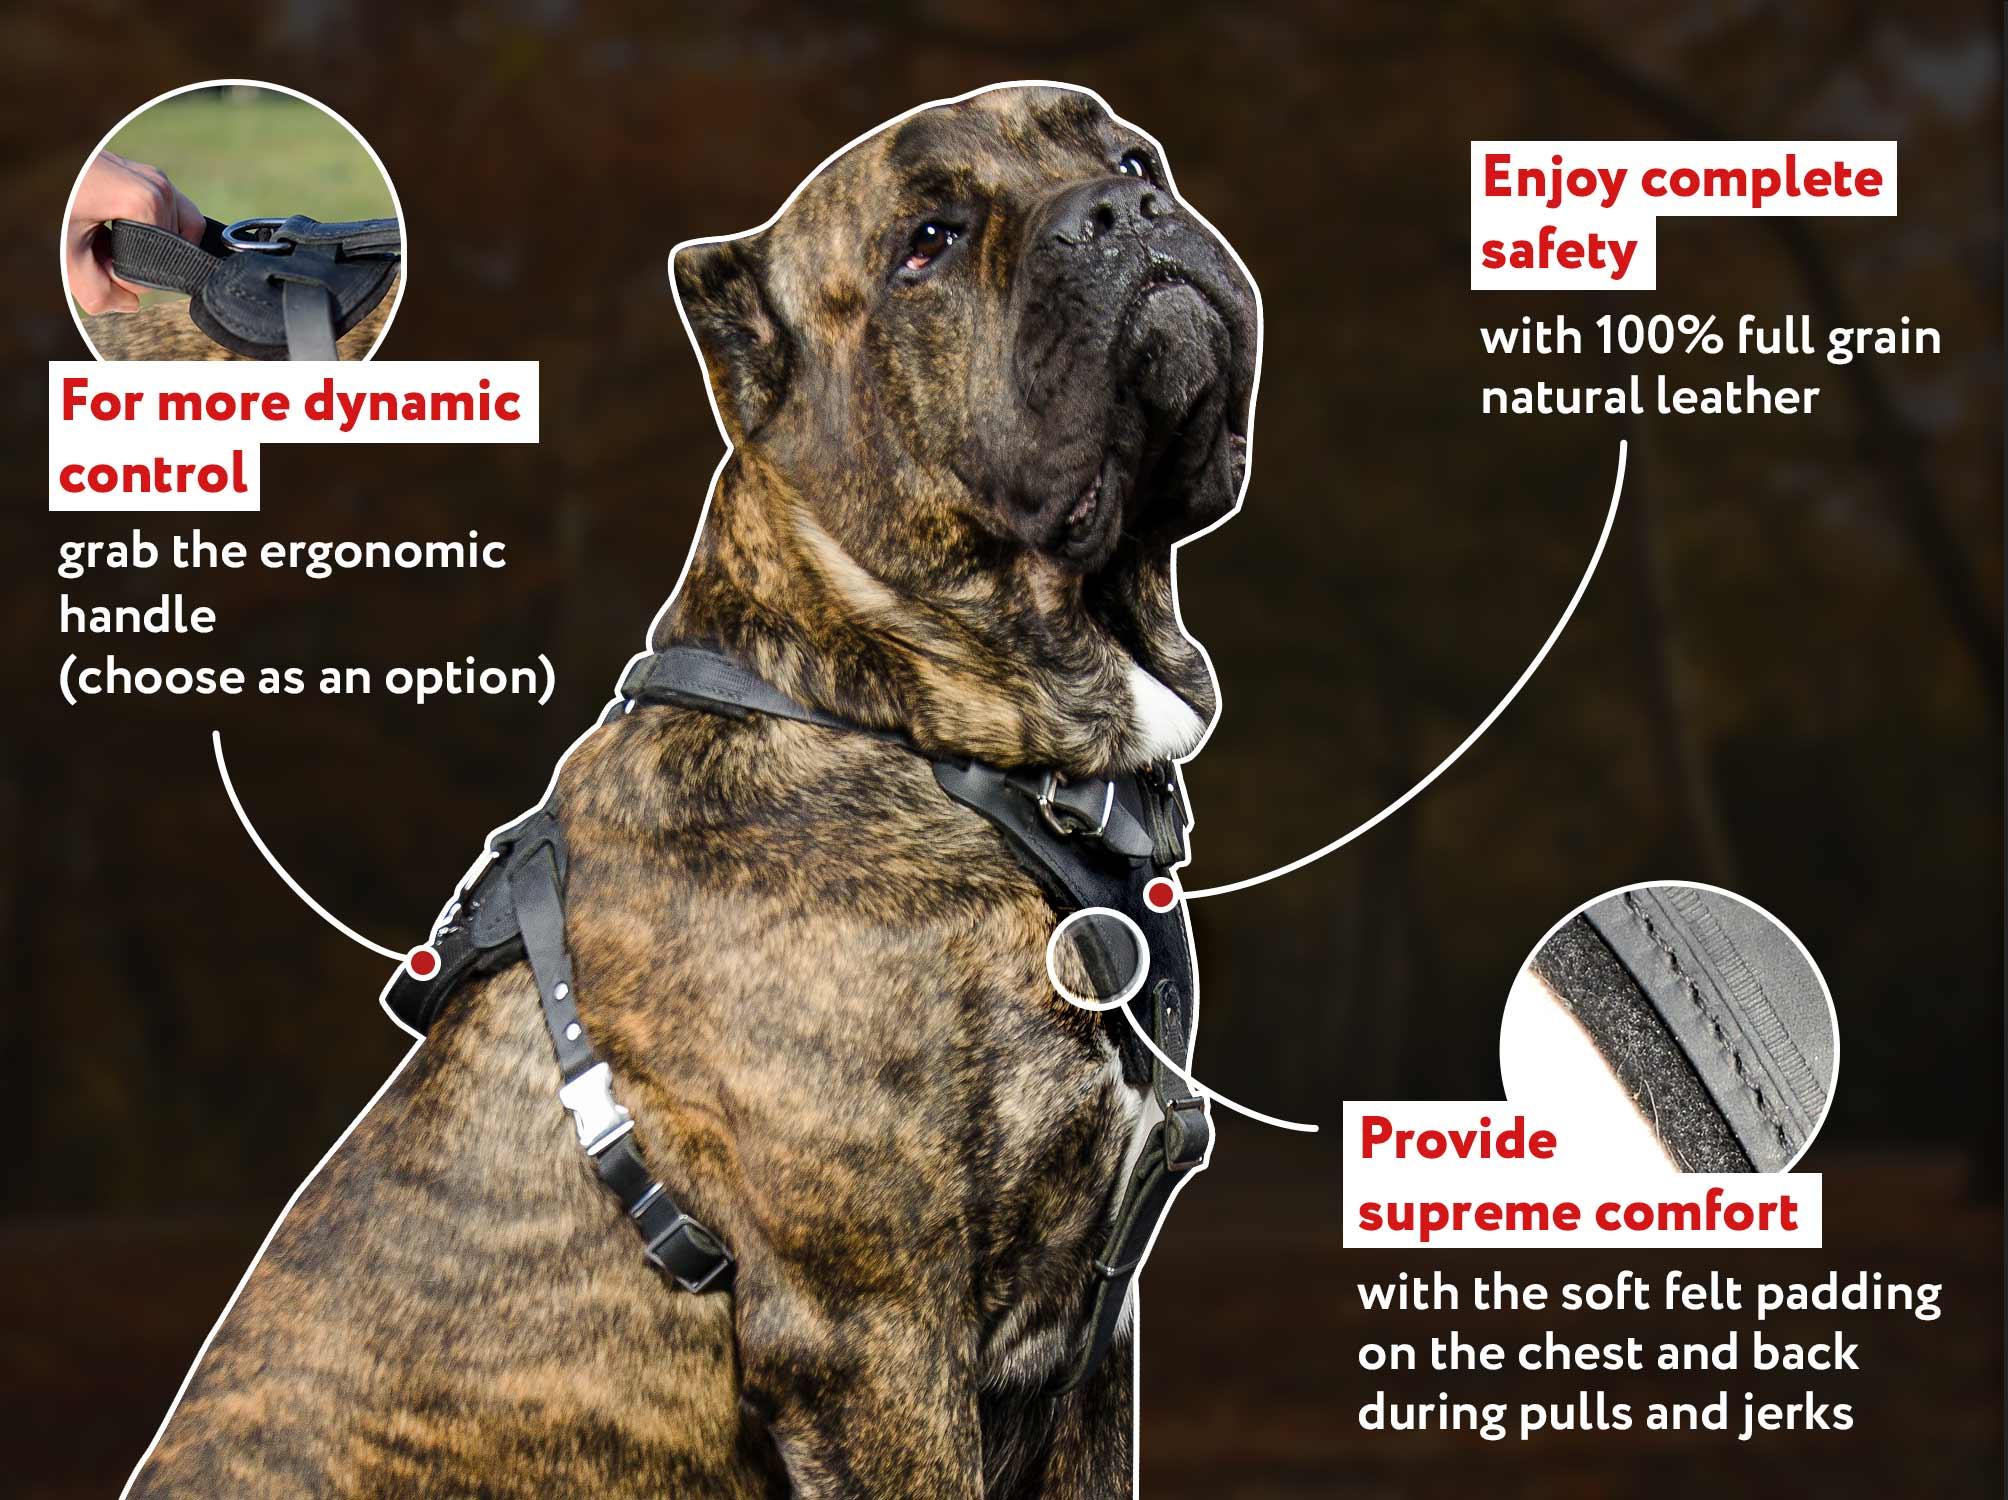 Cane Corso Dog Harness Cane Corso Dog Muzzle Cane Corso